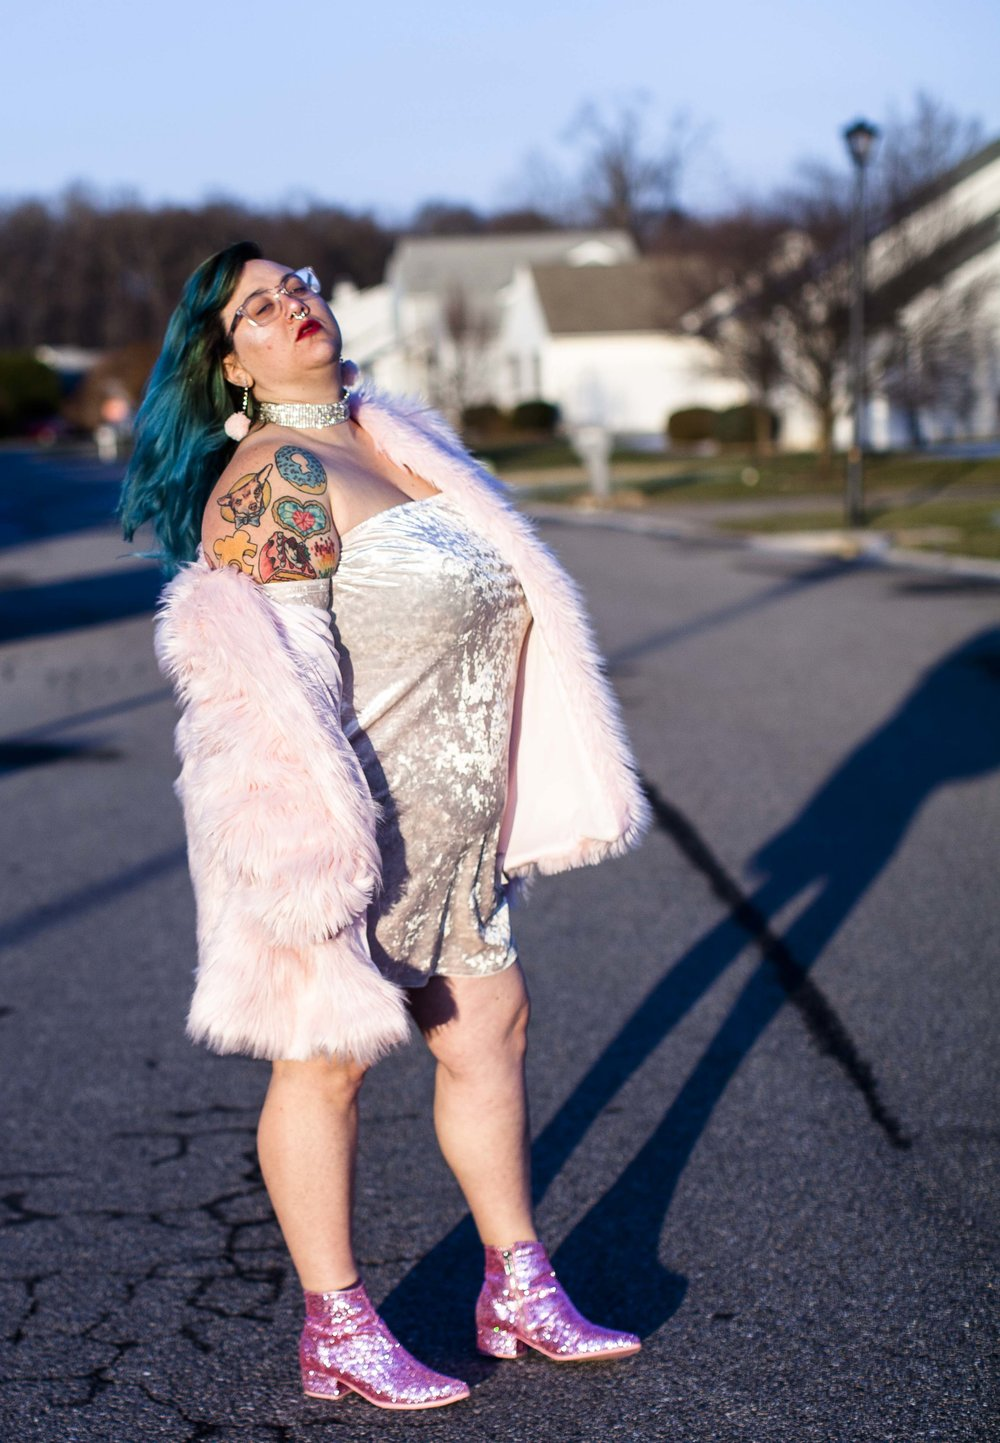 Chelsea Memmolo Plus Size Queer Fashion